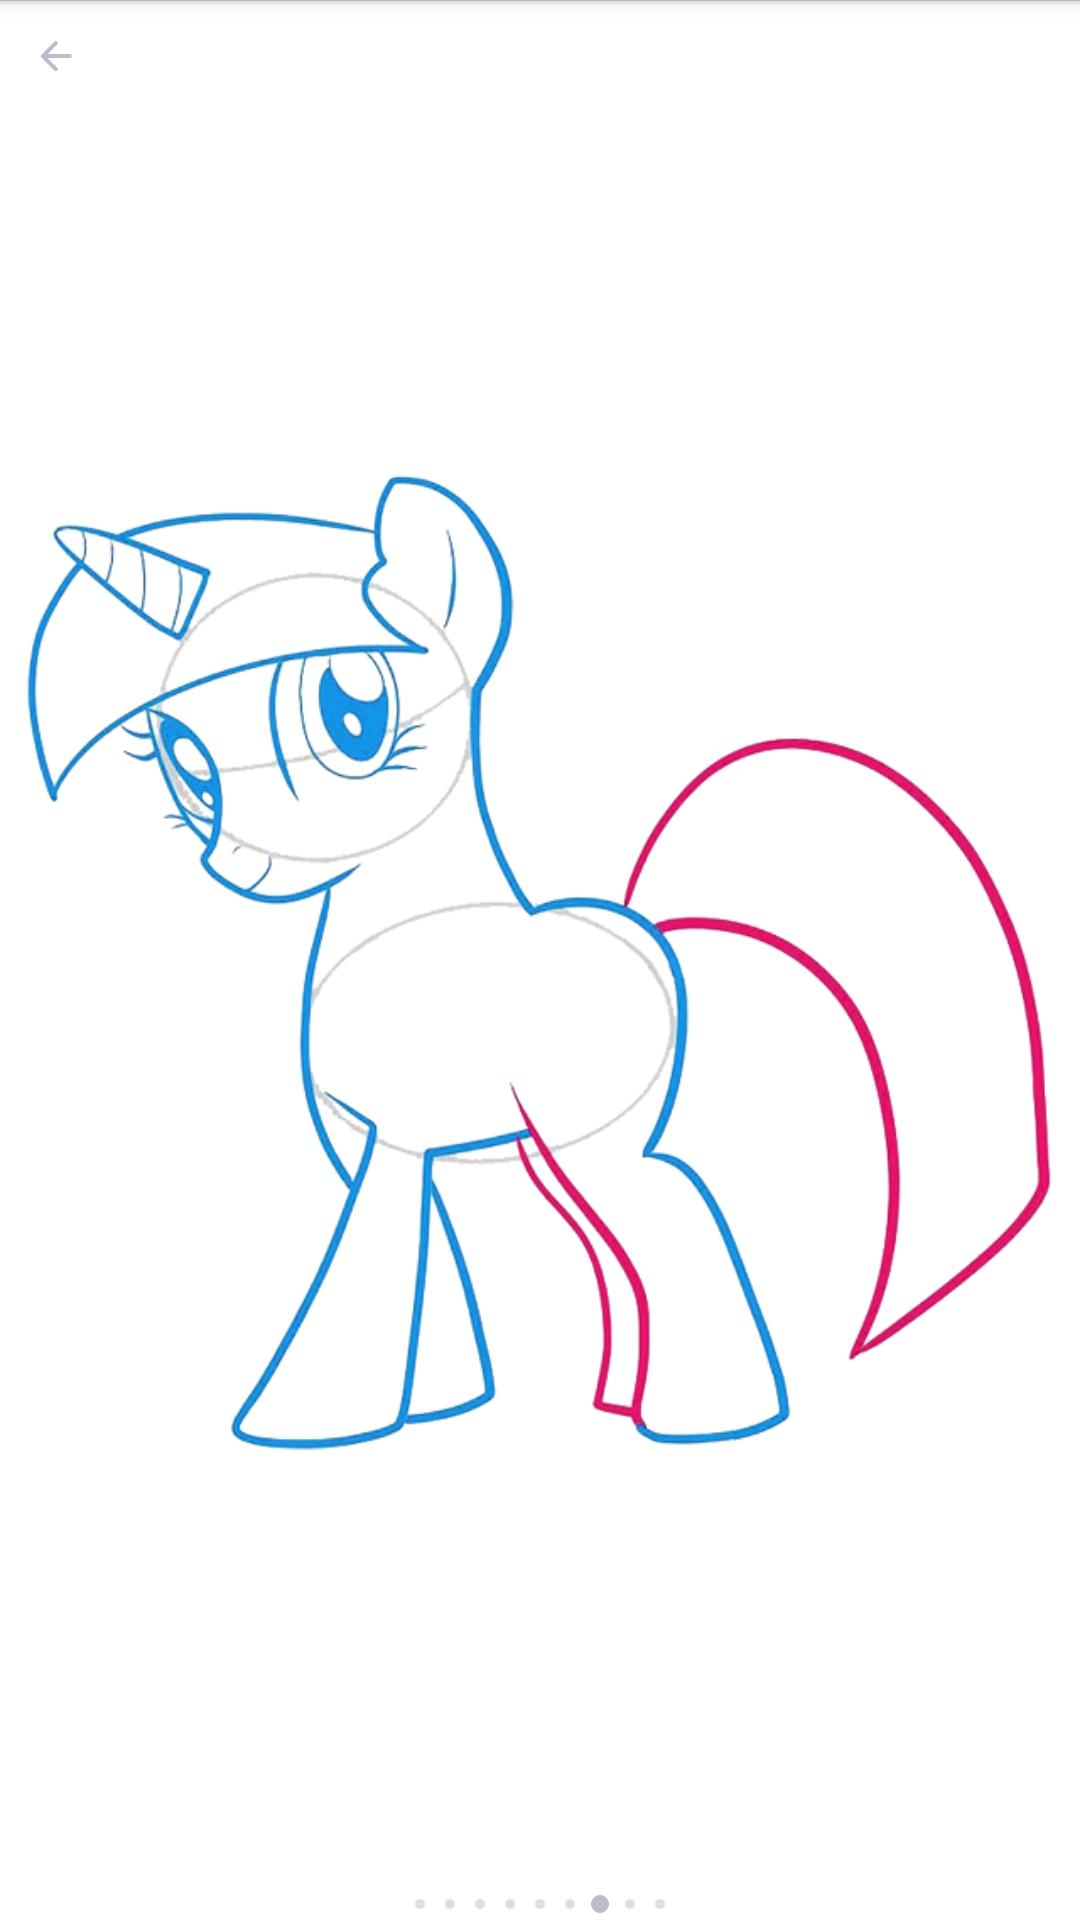 How To Draw Pony Alicorn Unicorn Pegasus For Android Apk Download